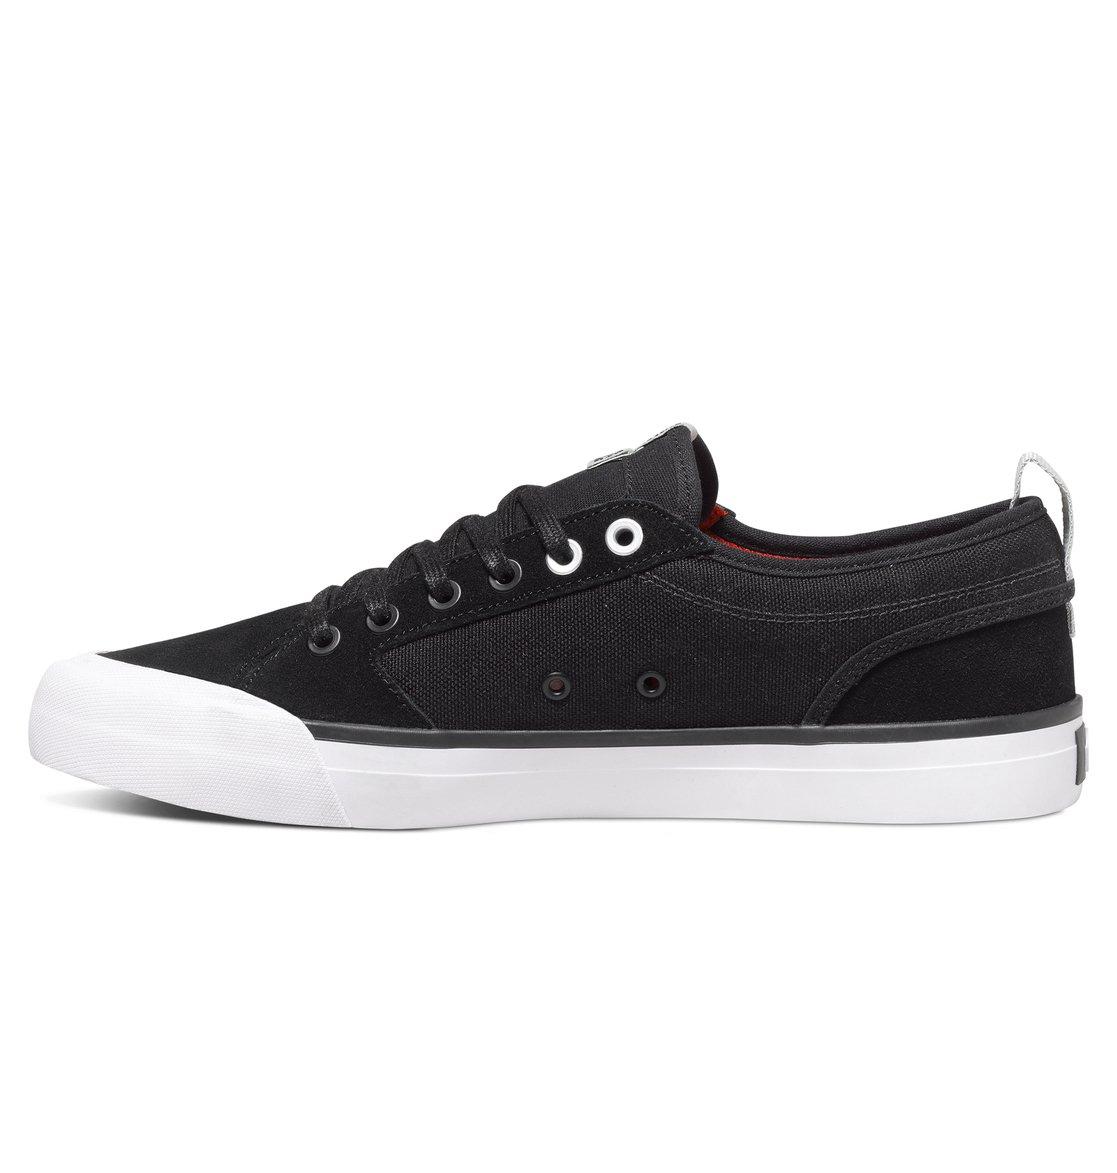 Skate shoes size 9 - 2 Men S Evan Smith S Skate Shoes Black Adys300203 Dc Shoes